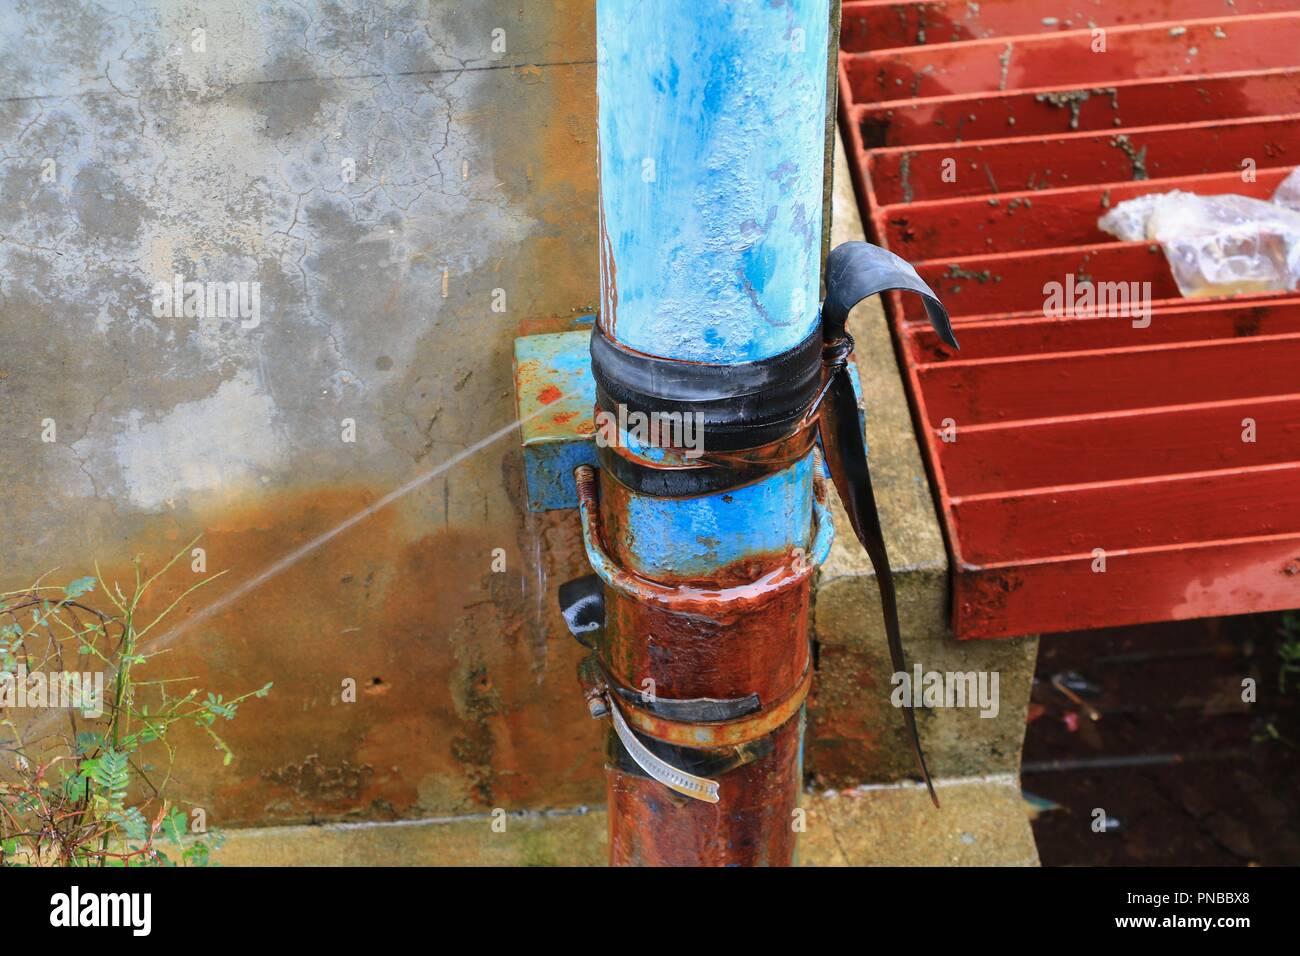 Water Leak Stock Photos & Water Leak Stock Images - Alamy